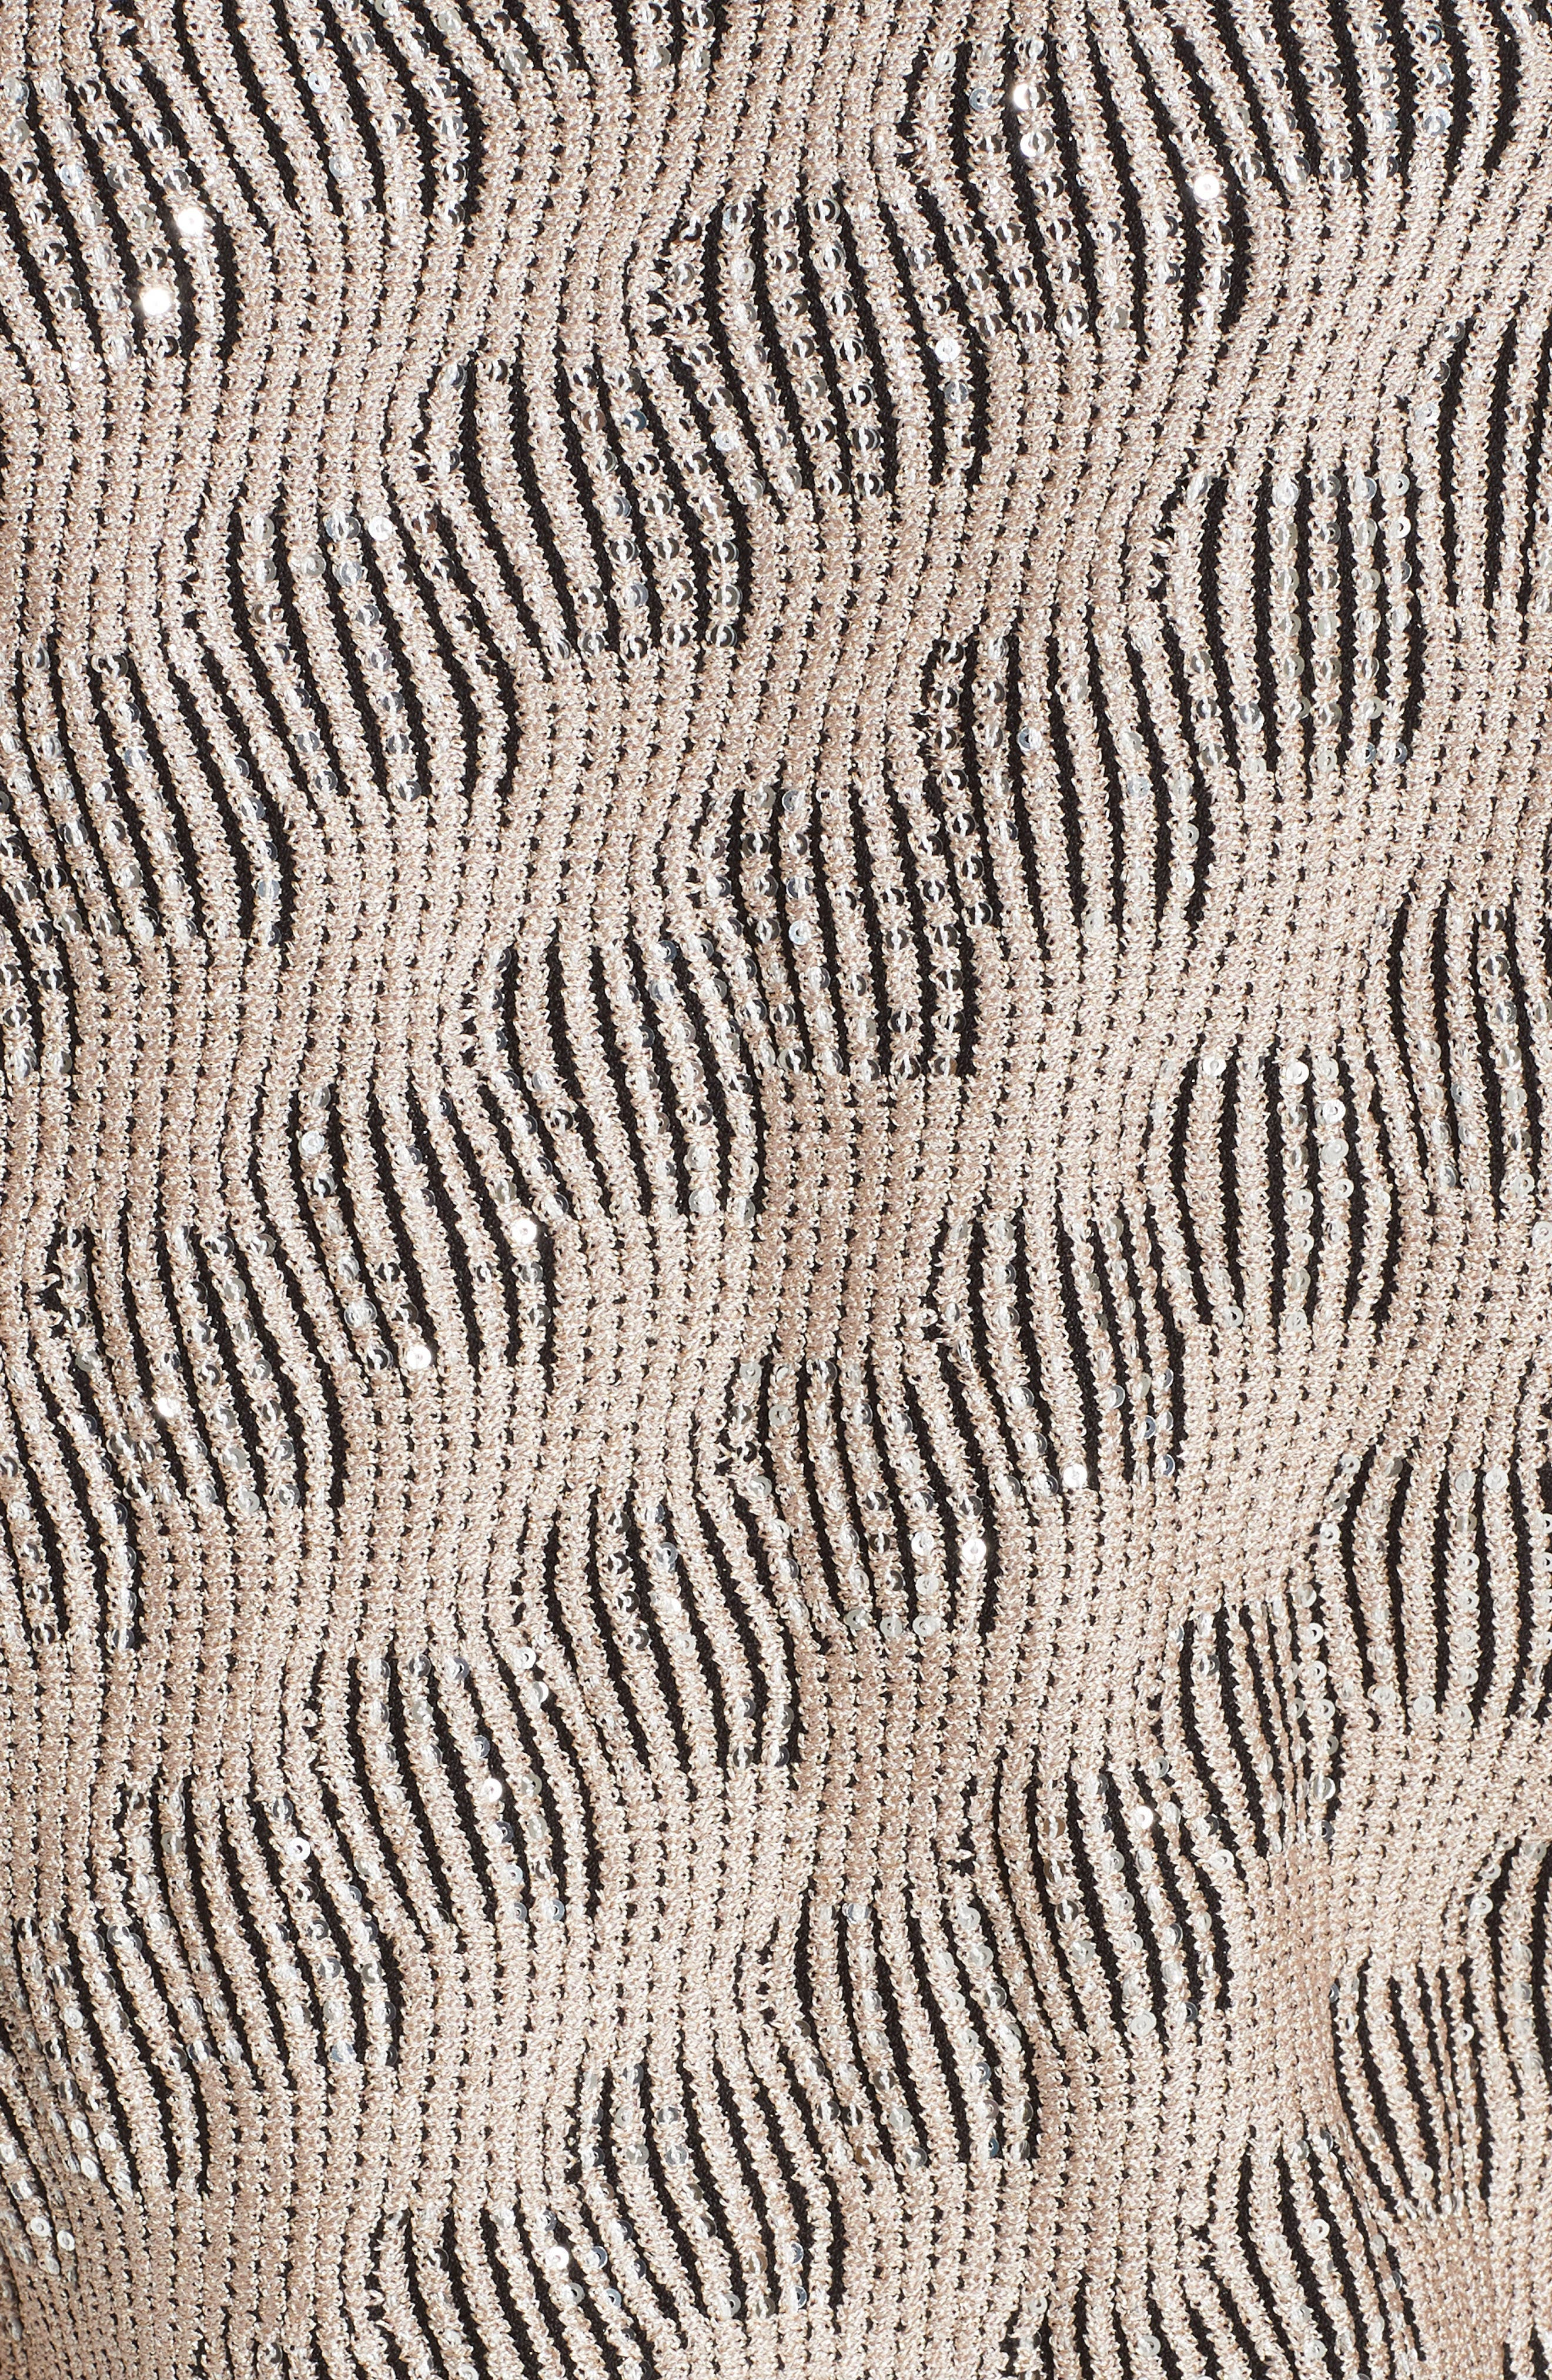 Inlaid Sequin Trellis Fit & Flare Topper,                             Alternate thumbnail 7, color,                             CAVIAR MULTI